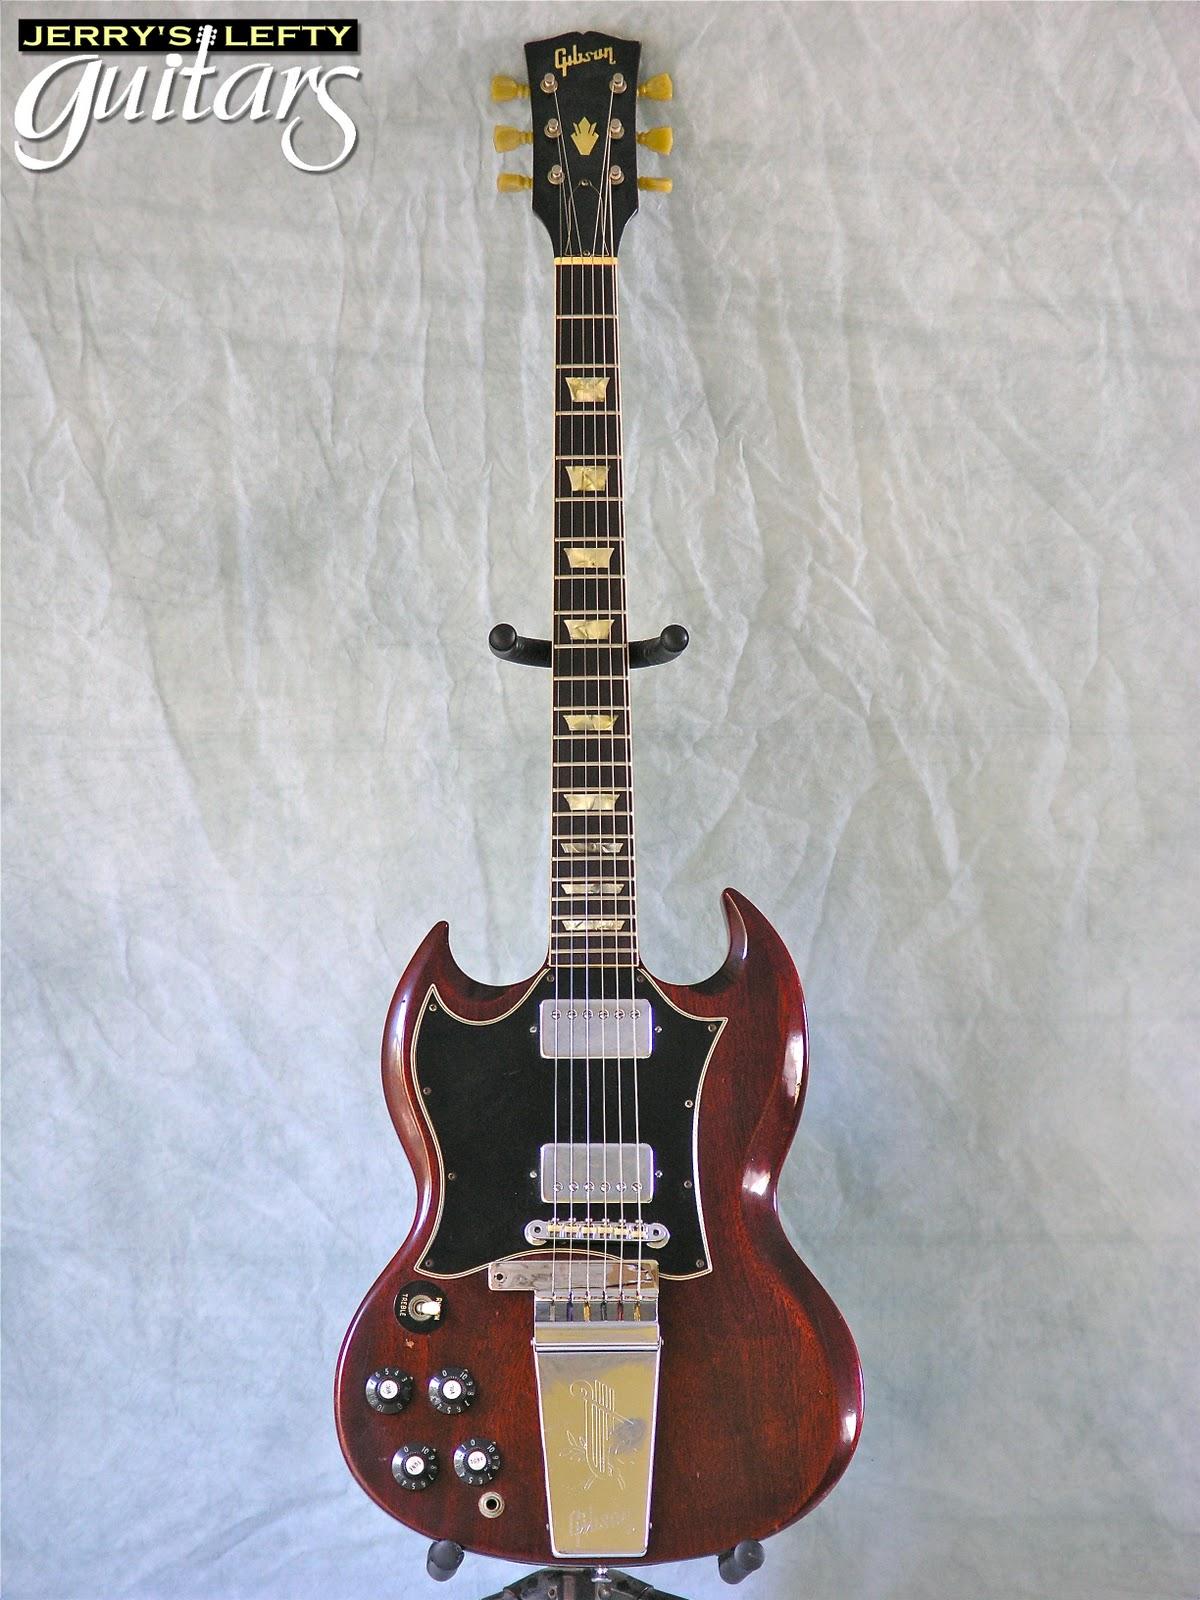 jerry 39 s lefty guitars newest guitar arrivals updated weekly gibson sg 1969 left handed 1 9 11. Black Bedroom Furniture Sets. Home Design Ideas